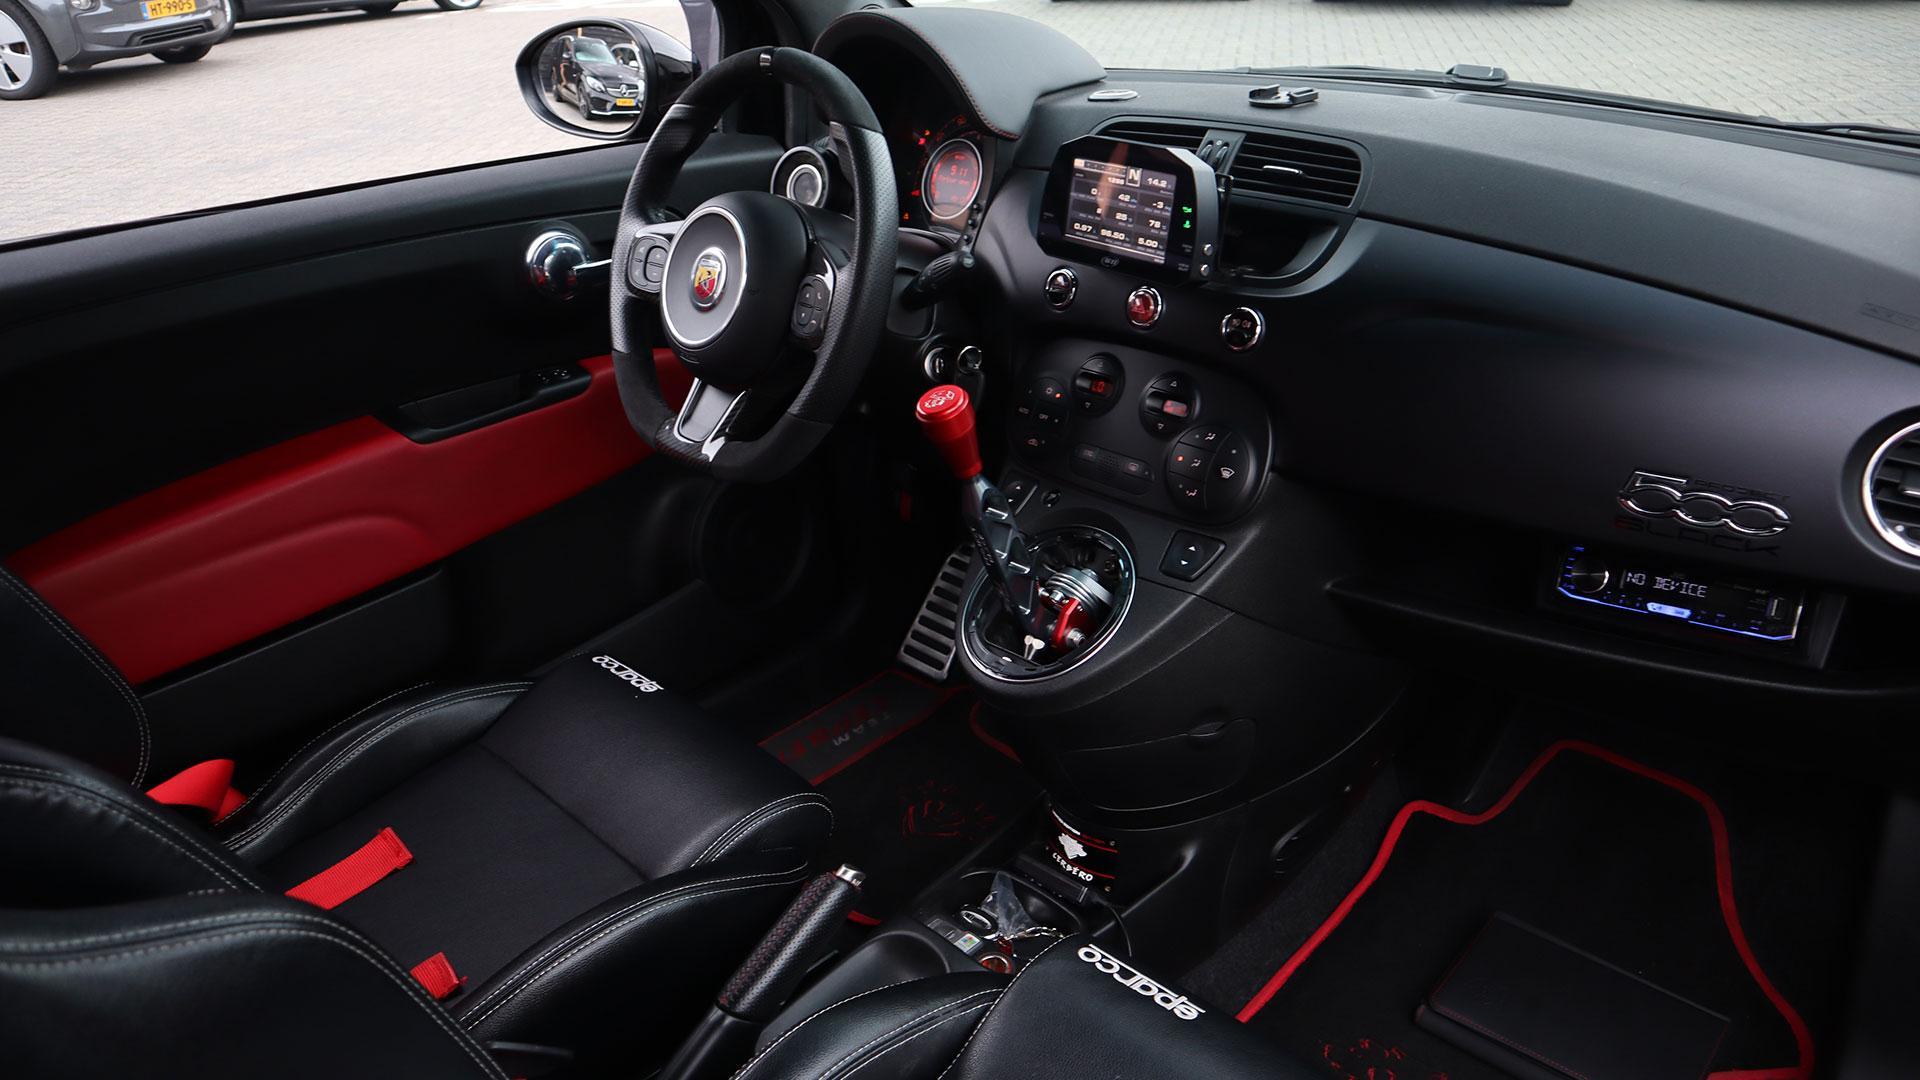 Interieur Fiat 500 Abarth met 500 pk